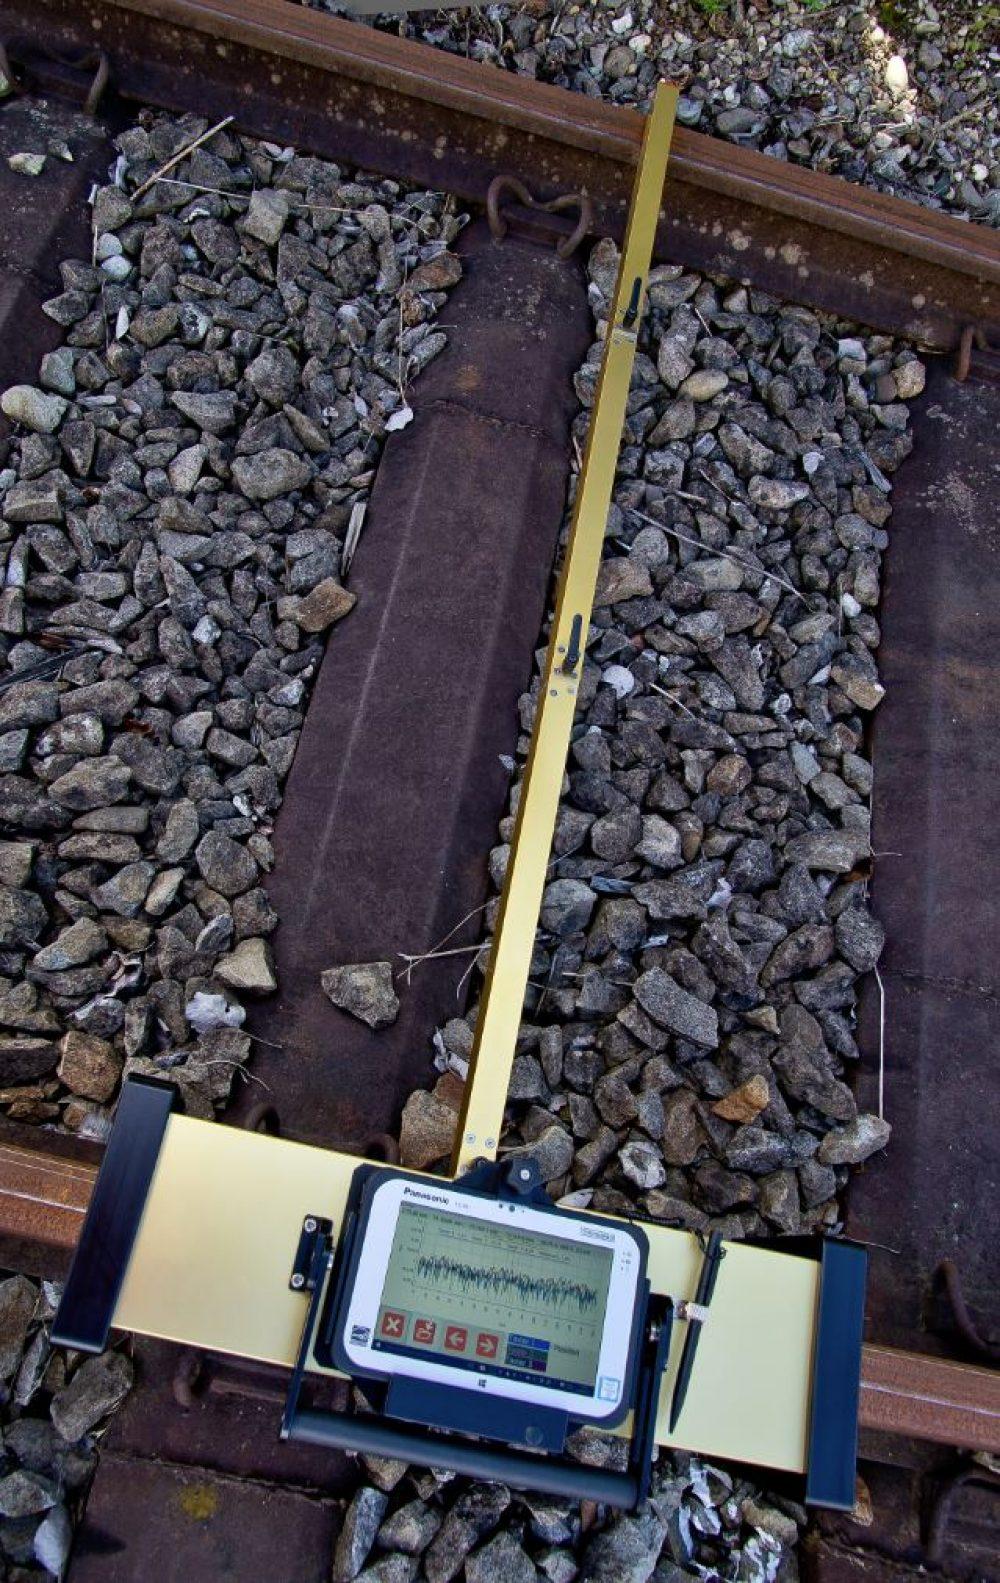 Railoppervlakte meetinstrument